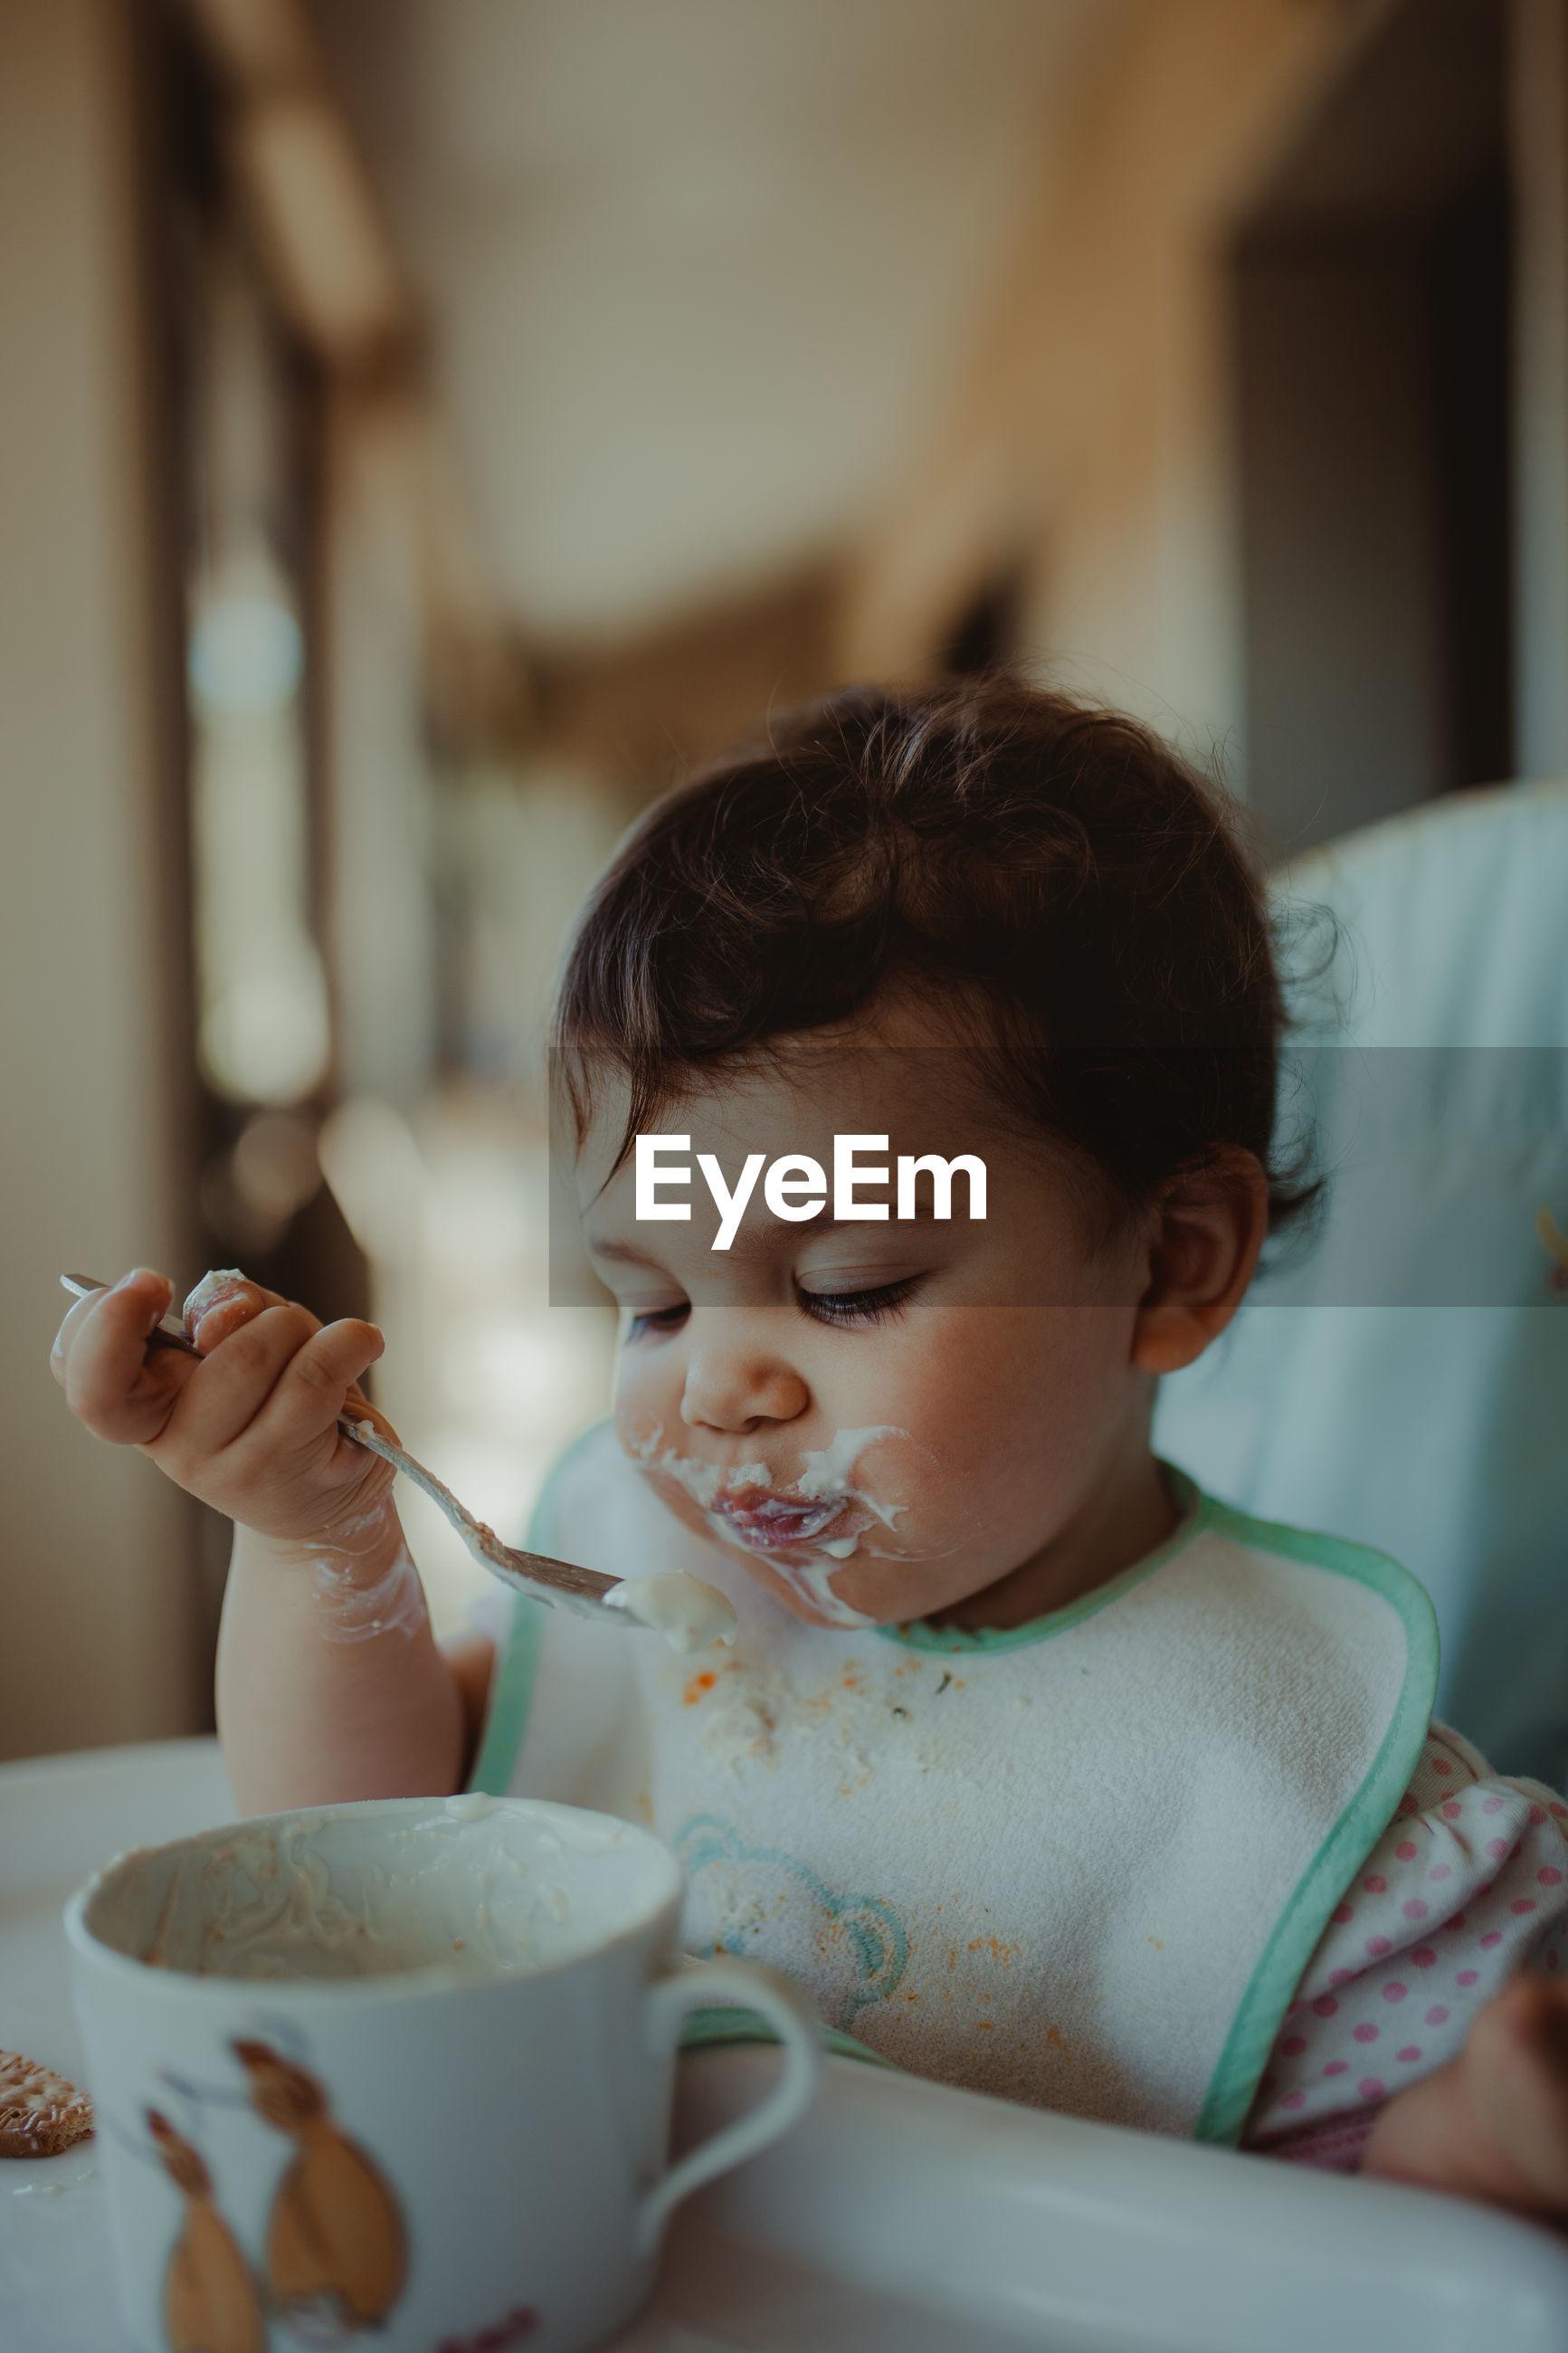 Baby girl having food